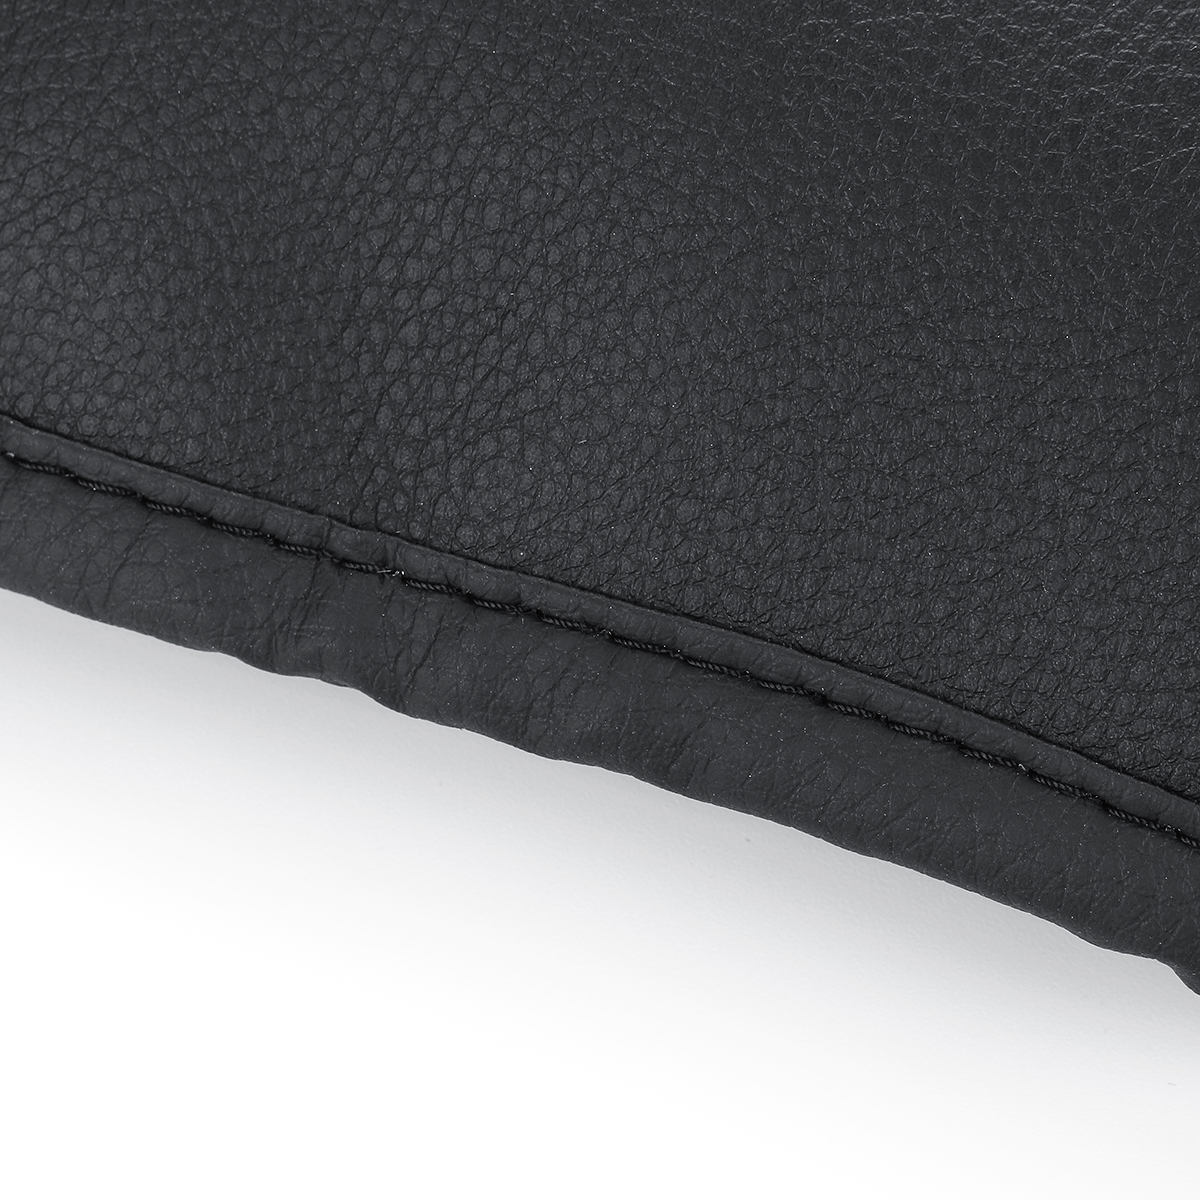 PU Leather Car Center Console Armrest Arm Rest Box Cover Cushion for SKODA Octavia A7 2015-2018